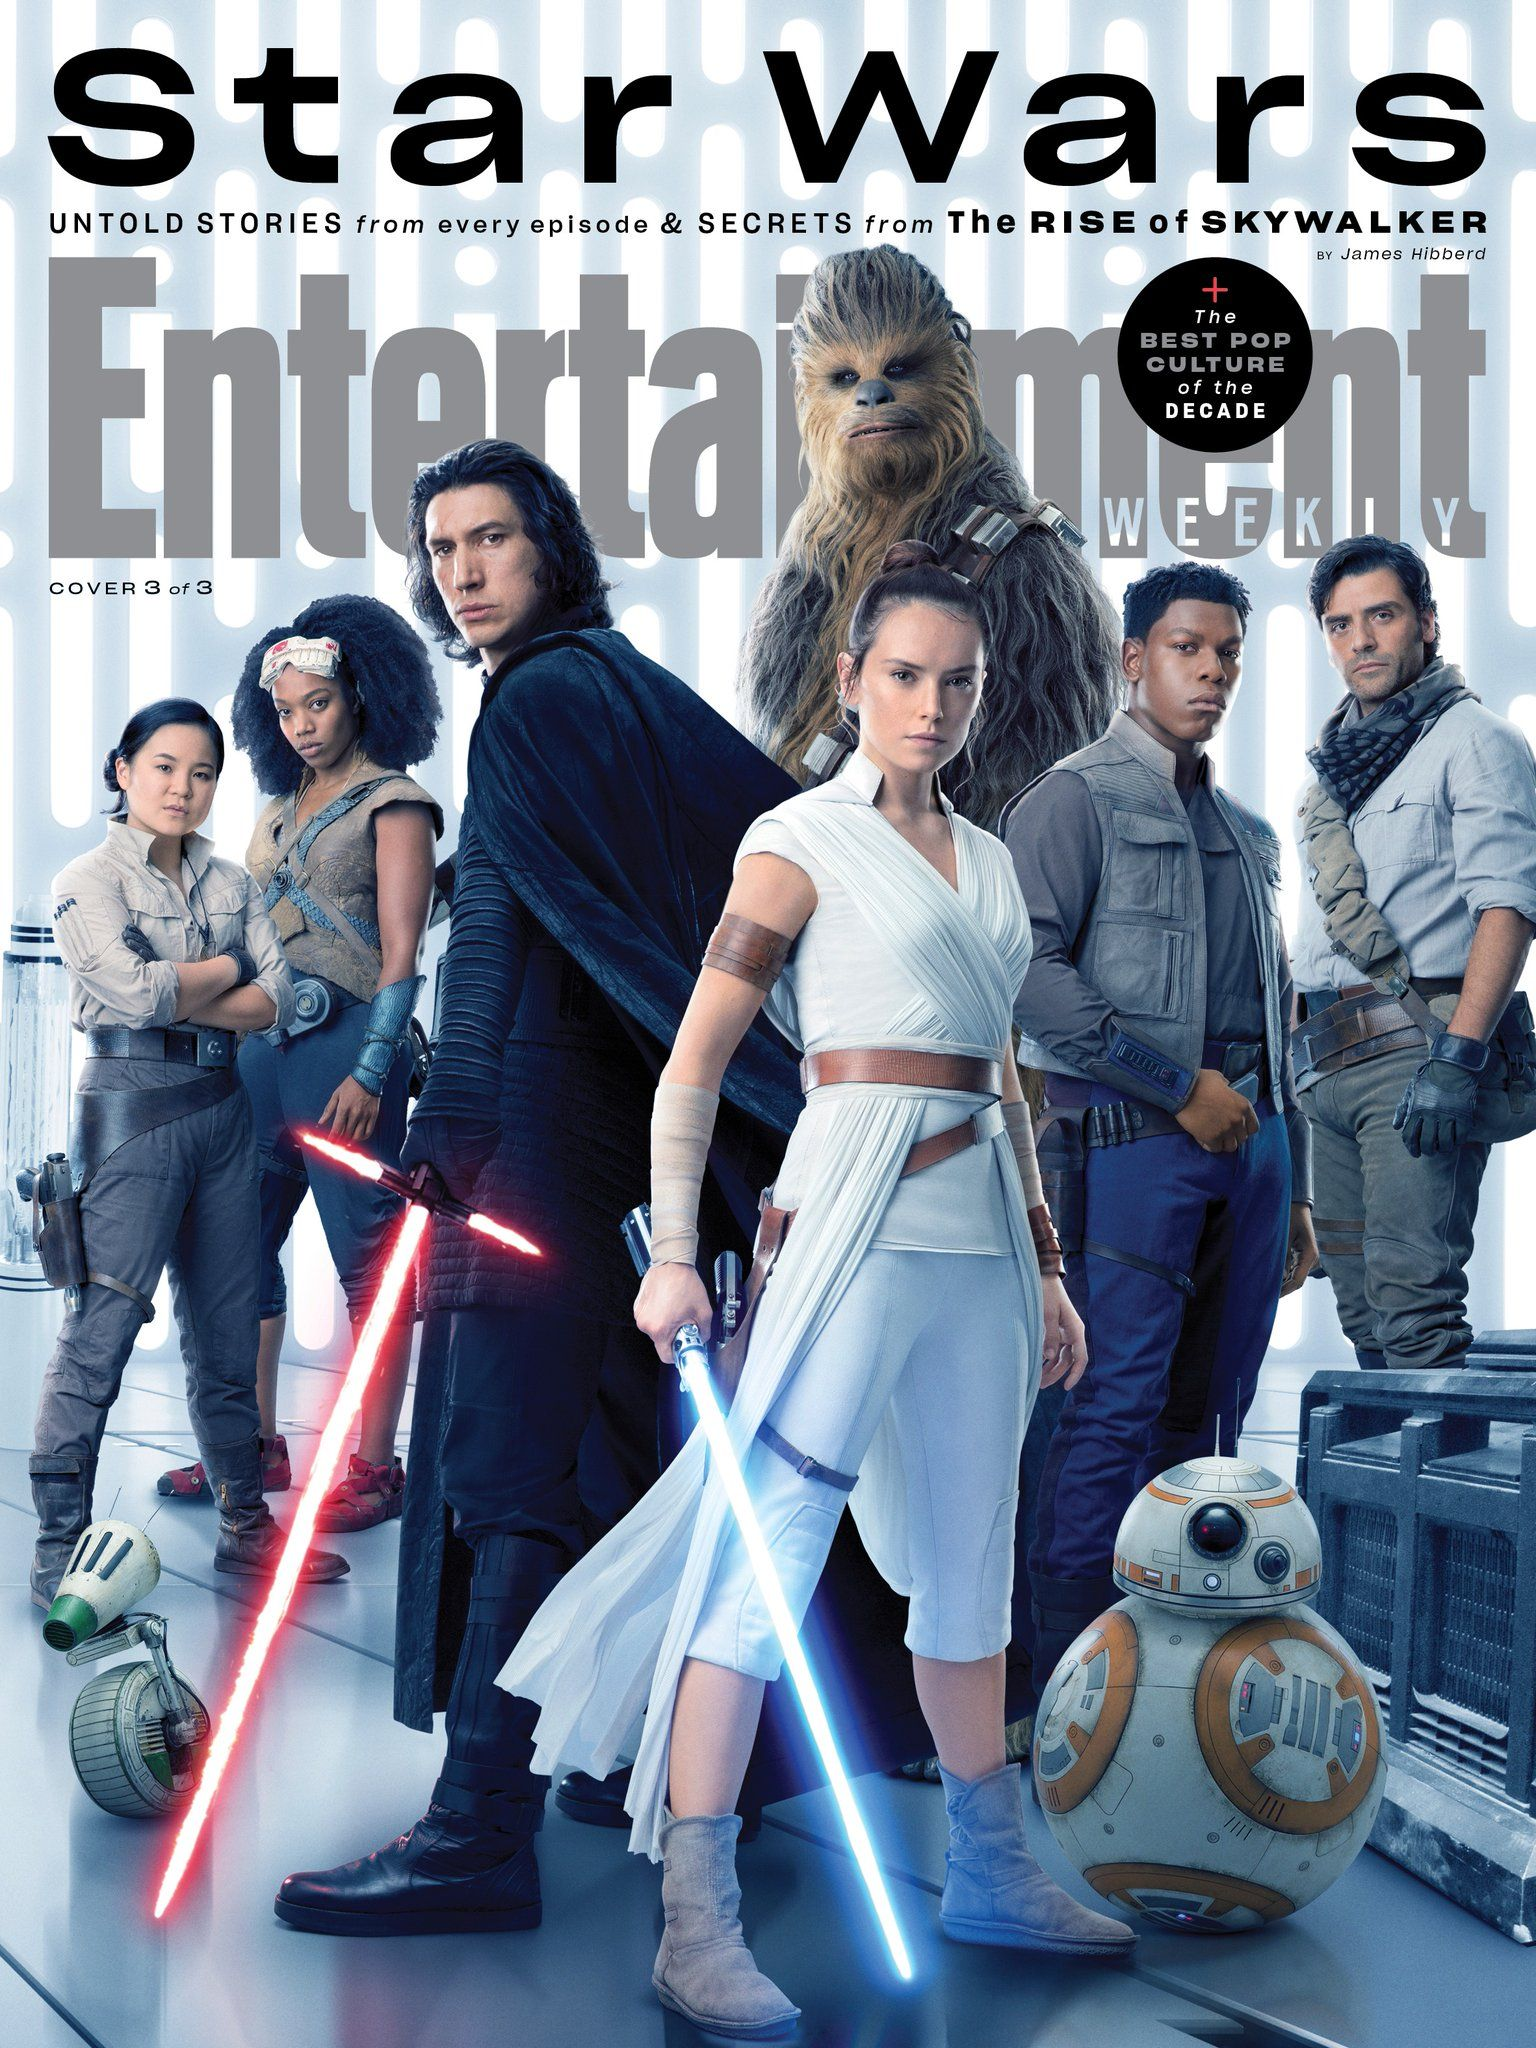 Pin By Taraan On The Rise Of Skywalker Star Wars Sequel Trilogy Star Wars Episodes Star Wars Movie